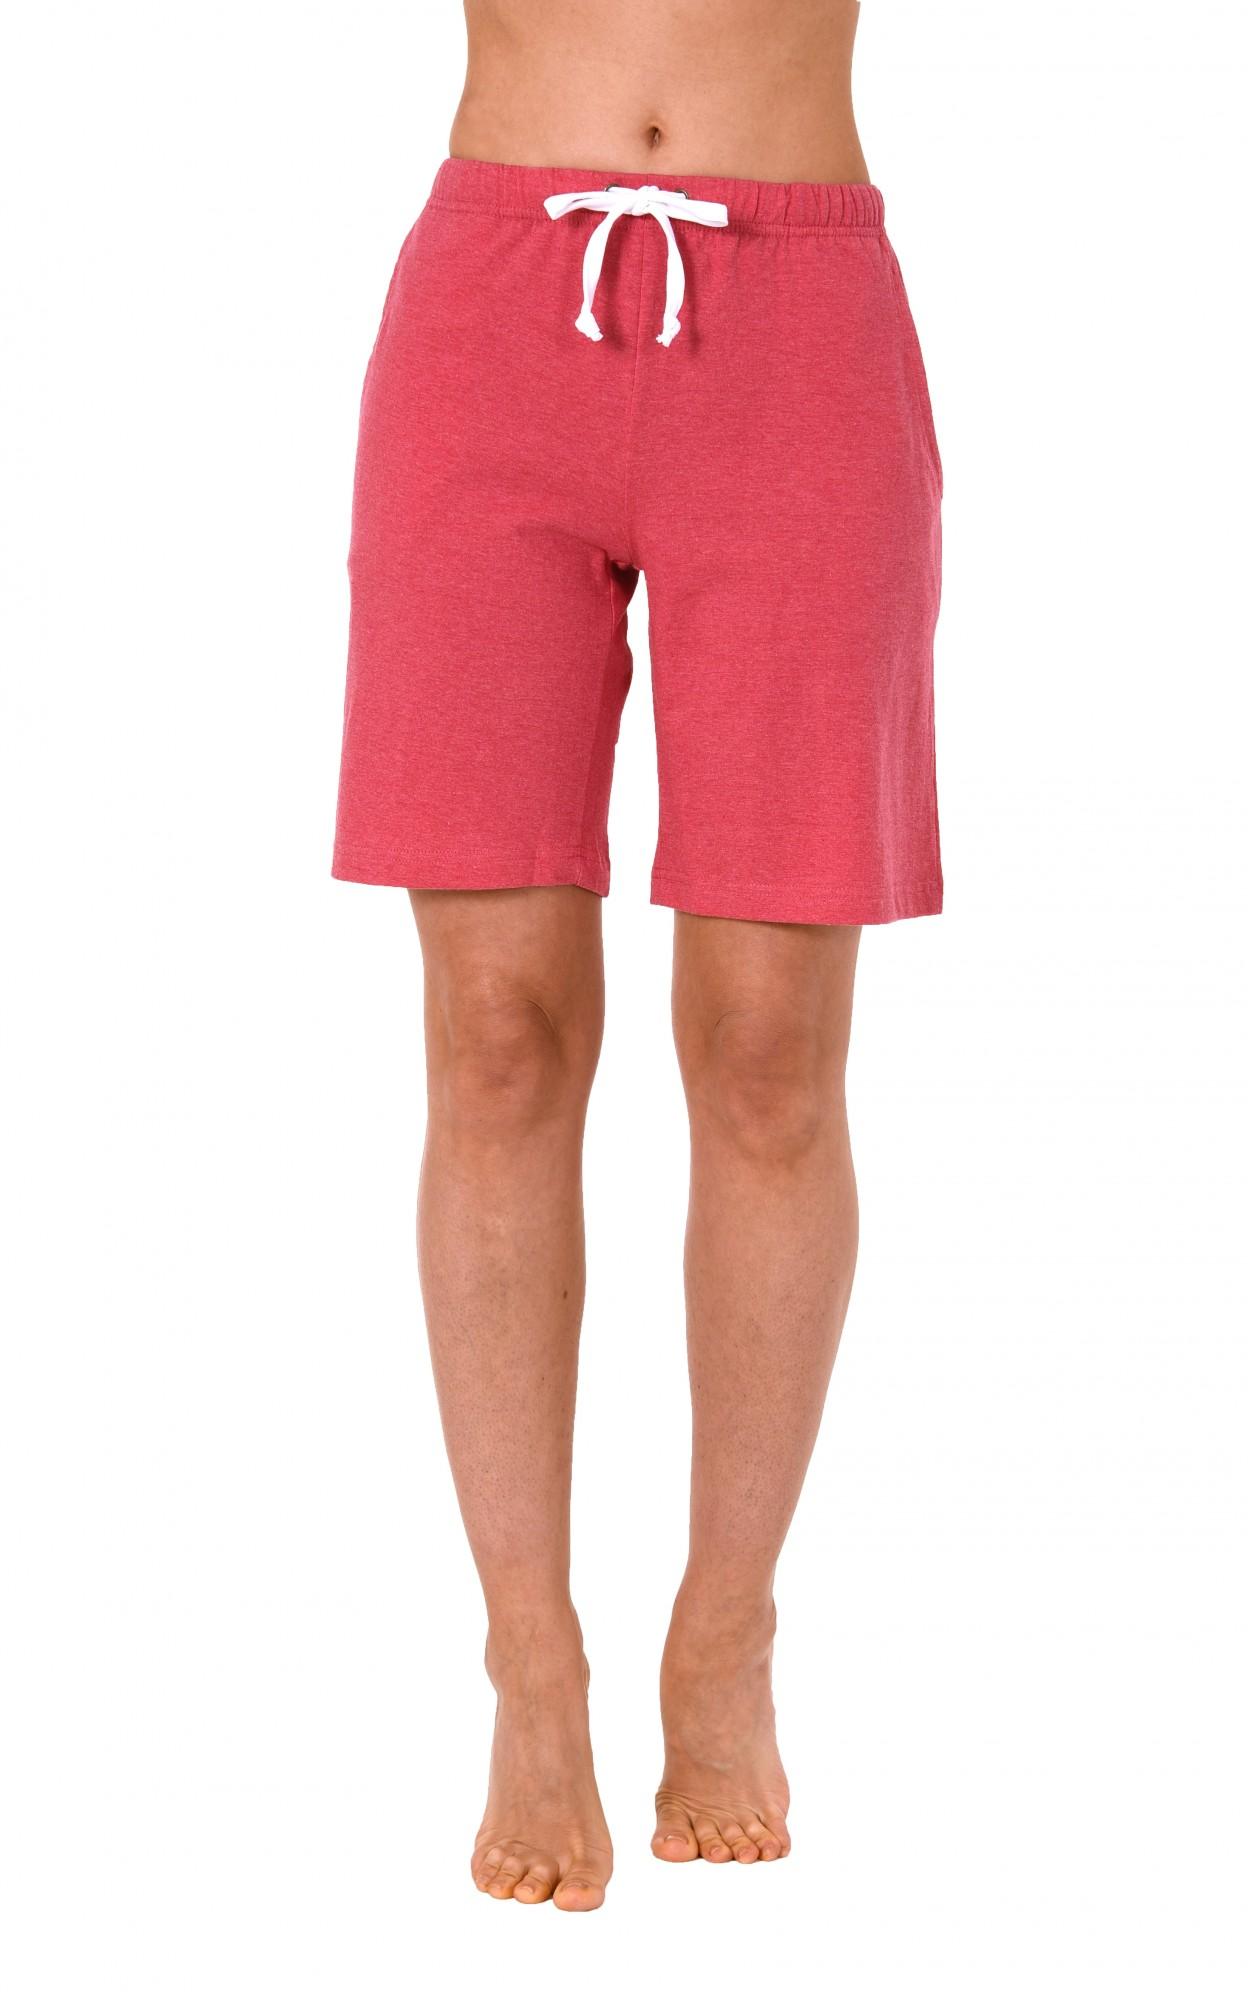 Damen Pyjama Bermuda kurze Hose  - Mix & Match - ideal zum kombinieren  224 90 902 – Bild 3